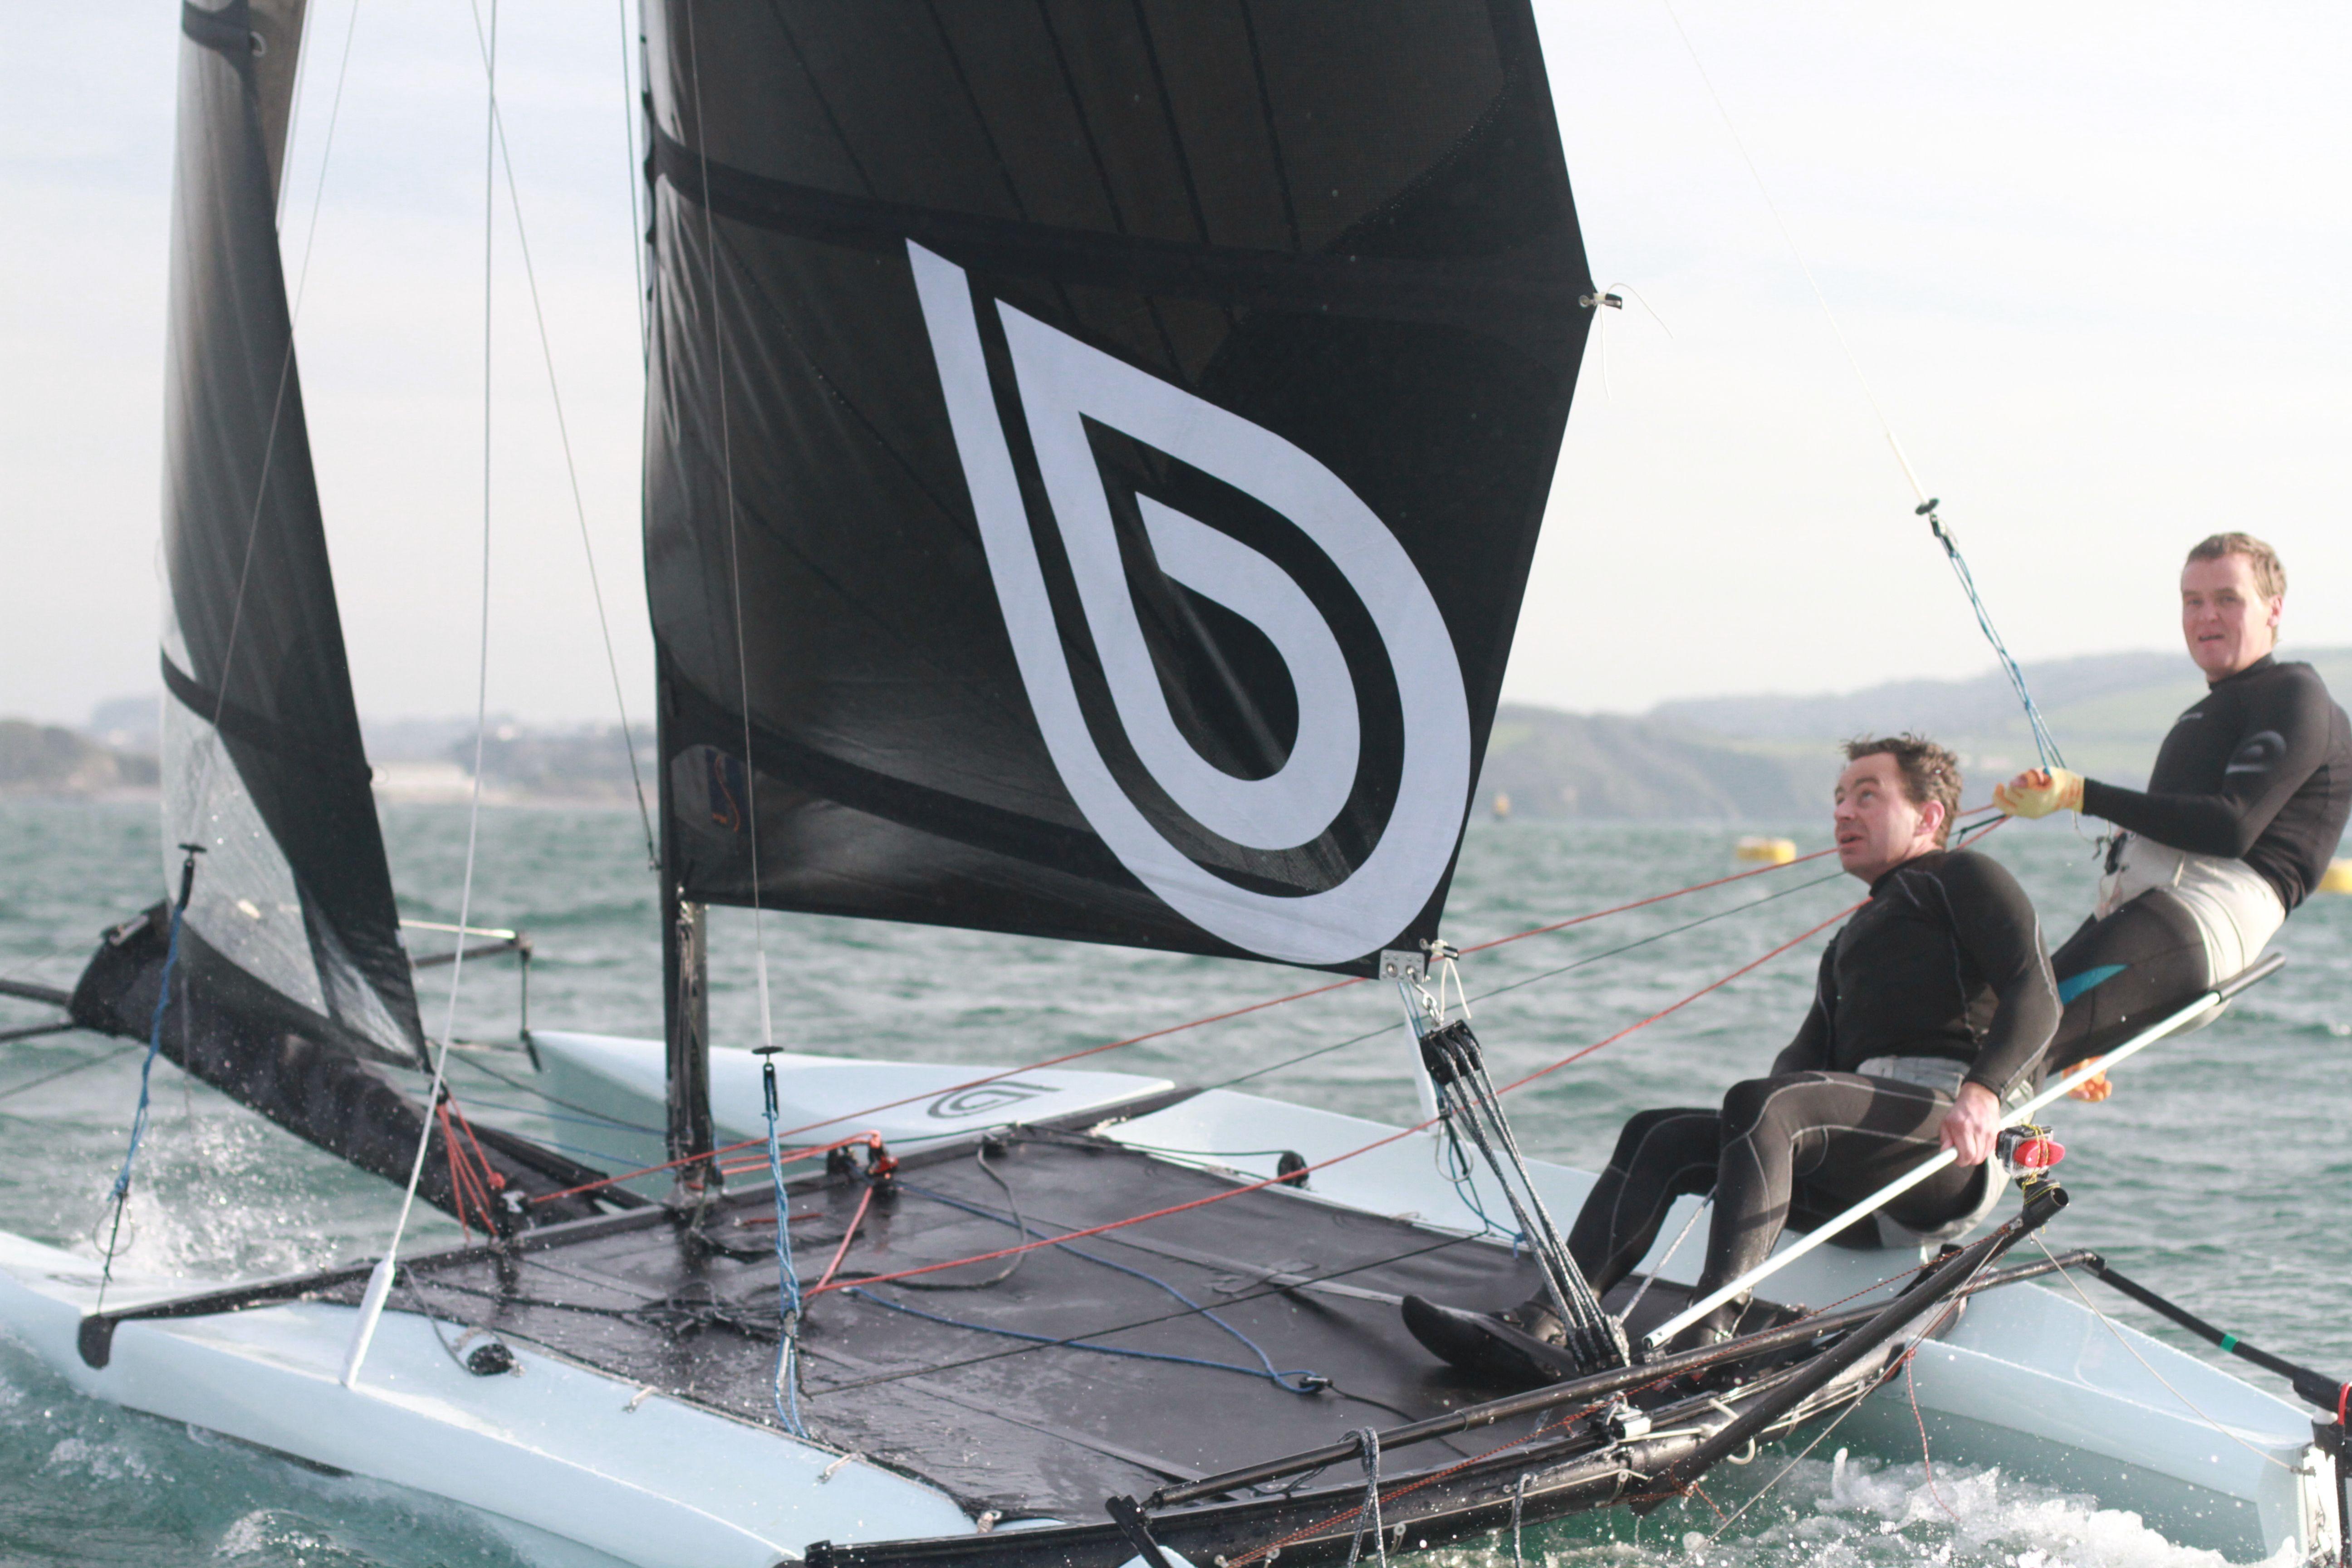 Watercooled XC5 double-hander beach catamaran | beach catamaran